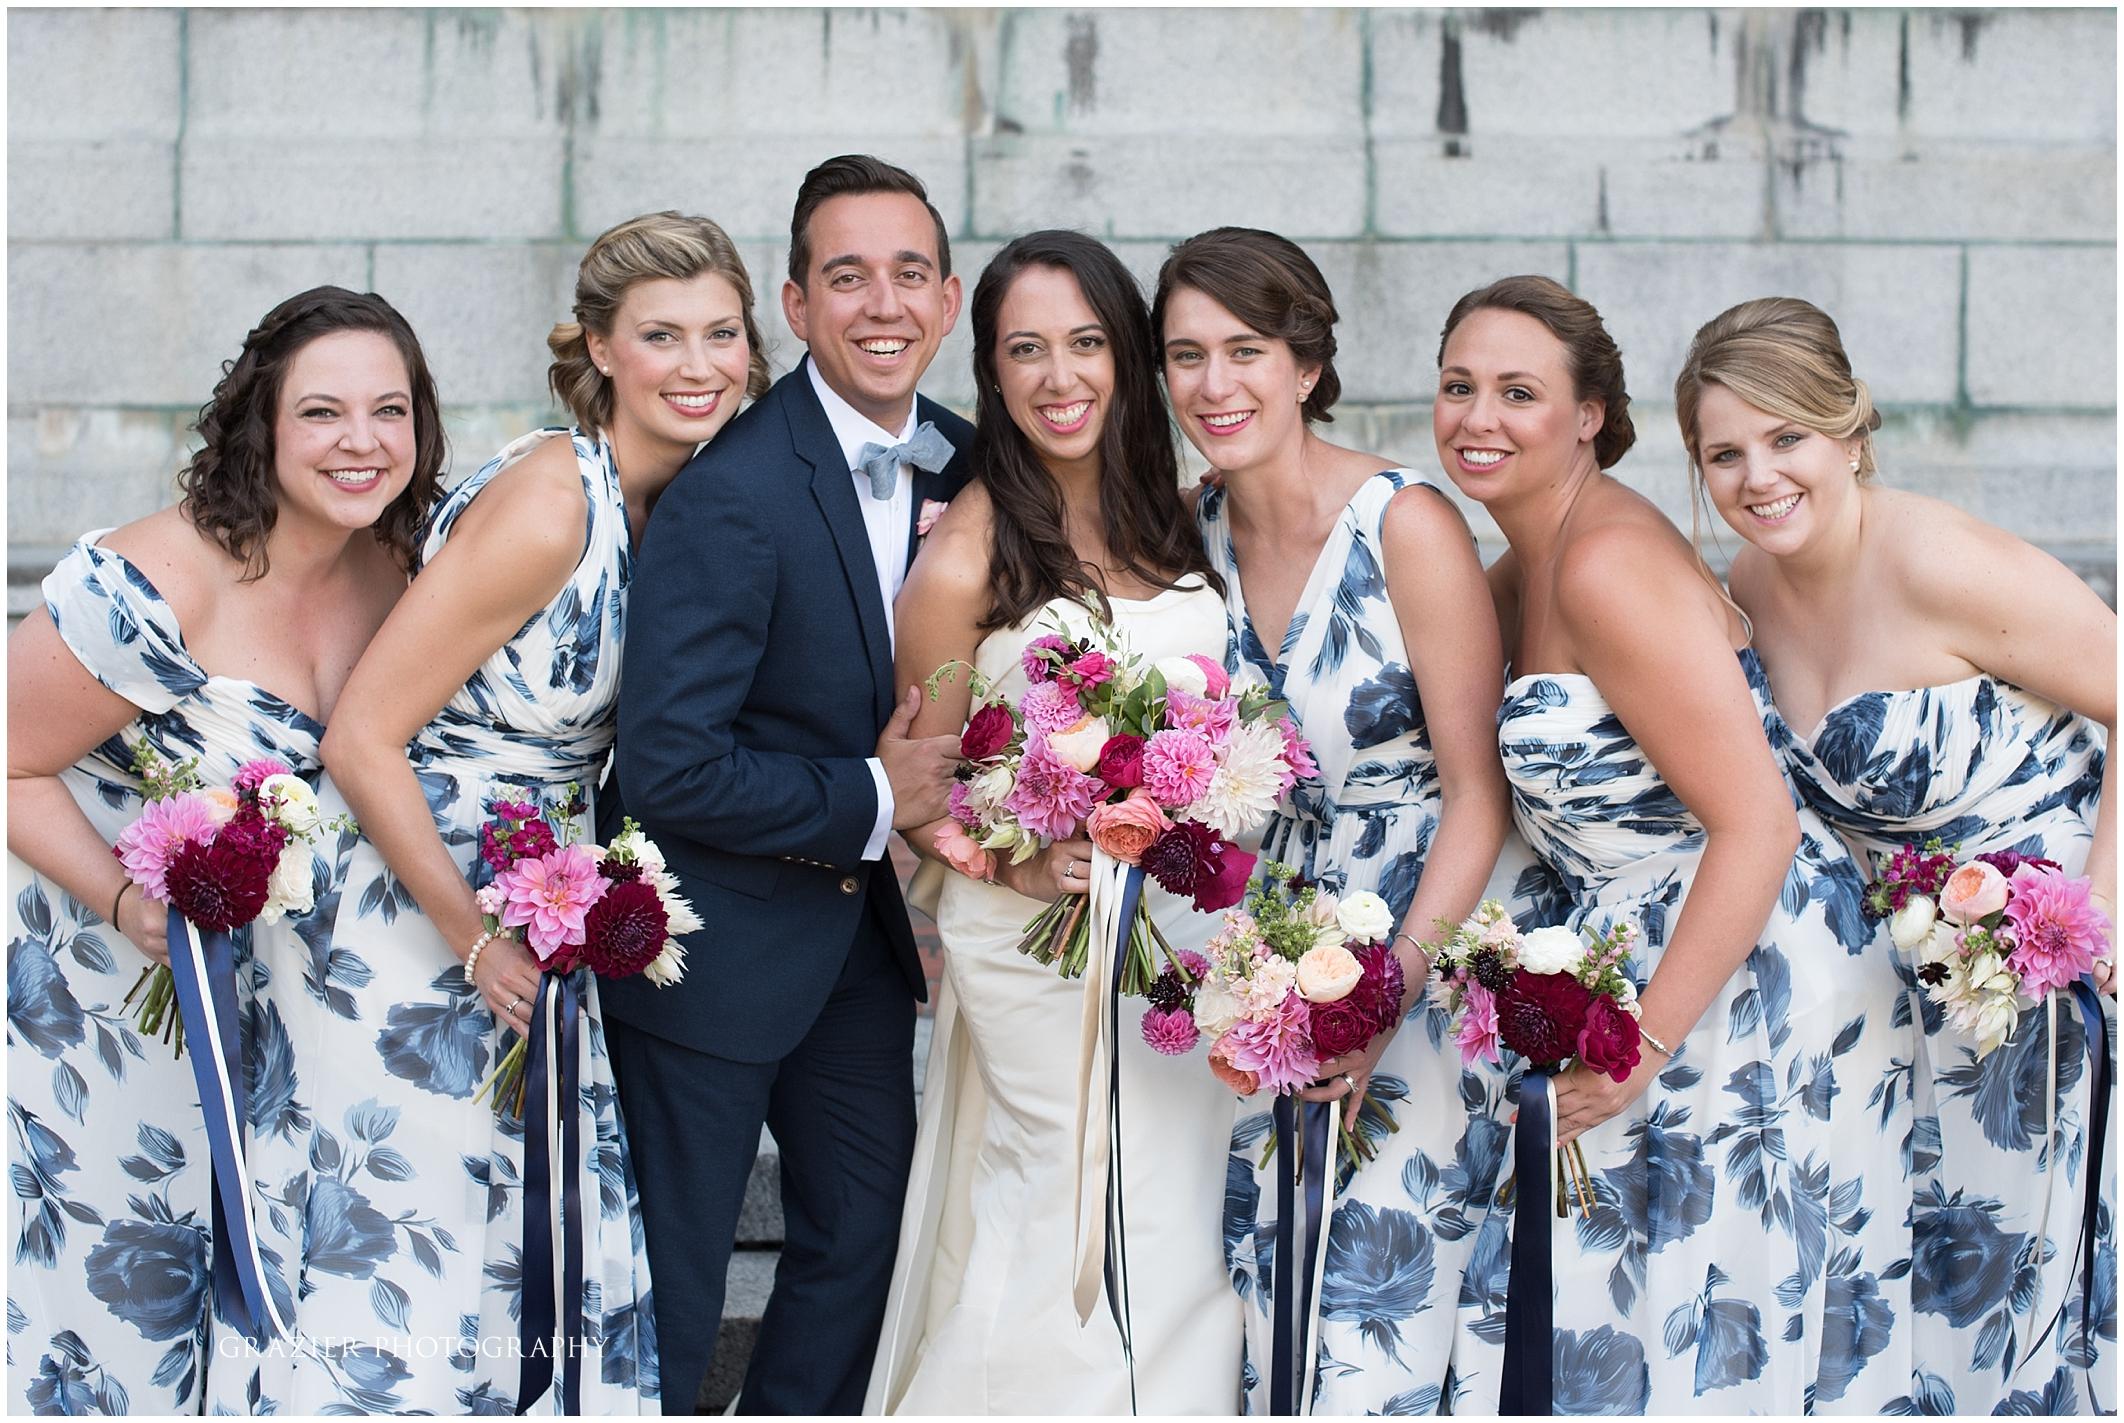 blue and white floral bridesmaid dresses Cape Cod